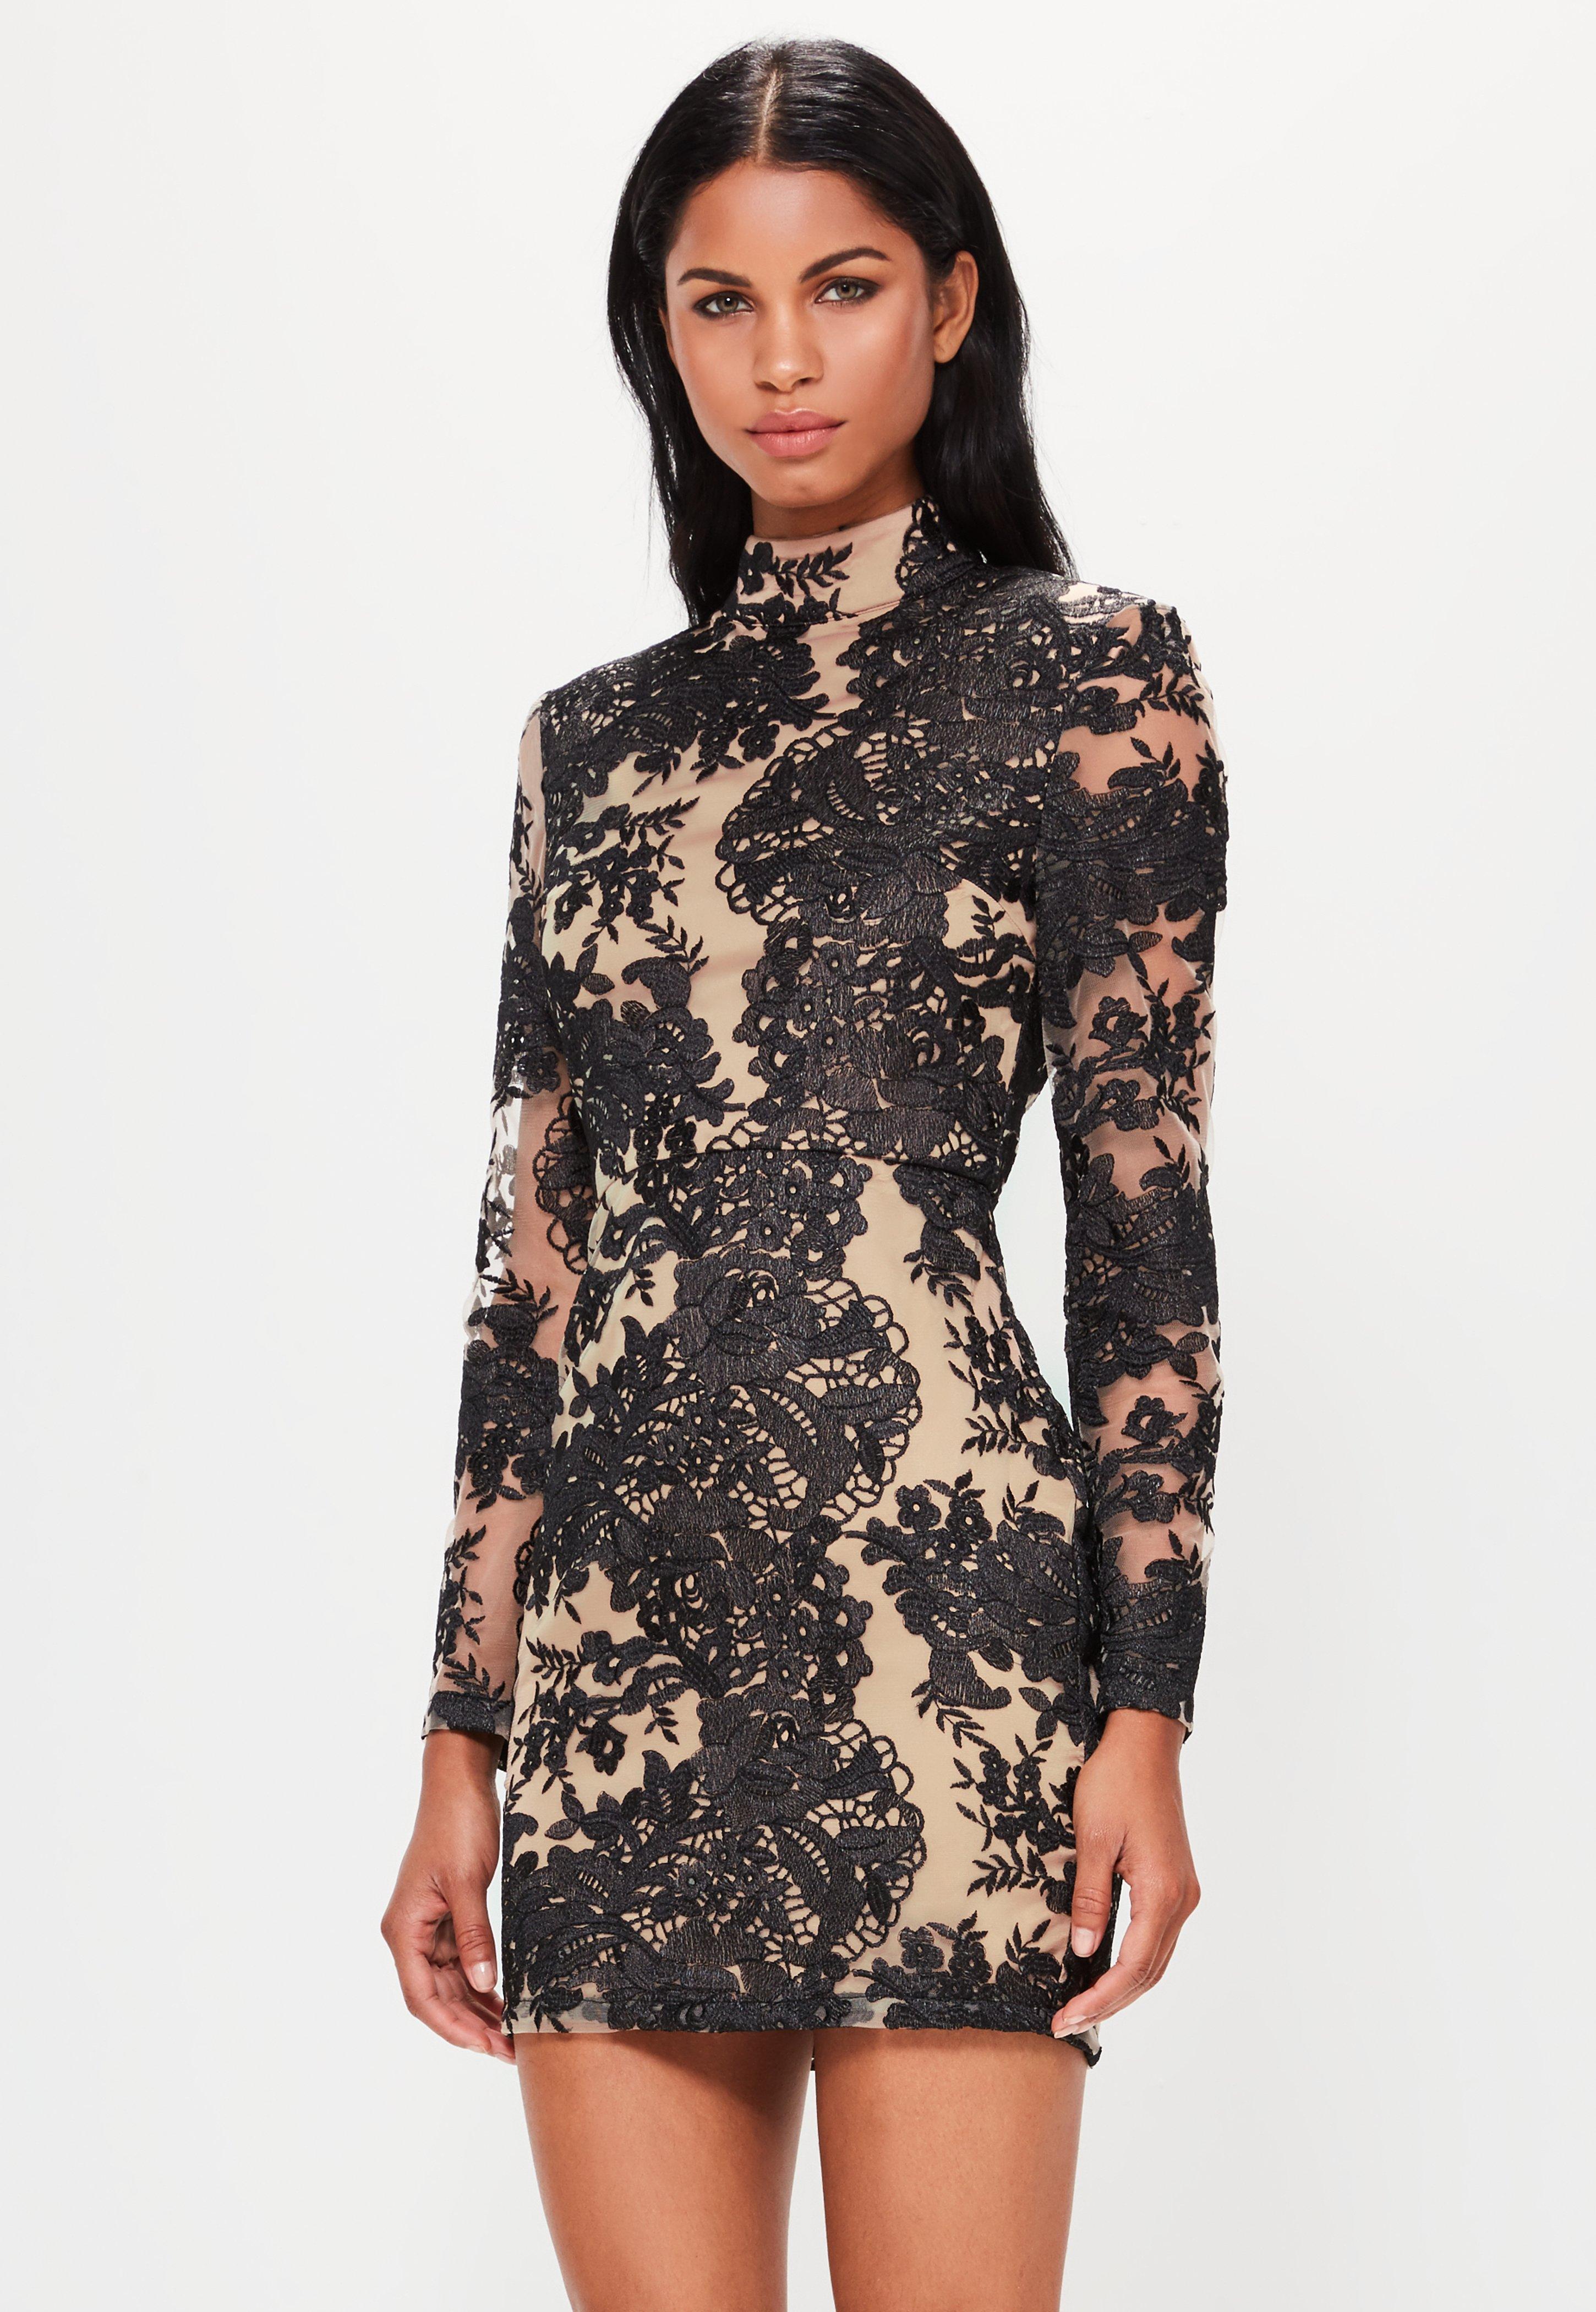 Black bandage lace up high neck bodycon dress